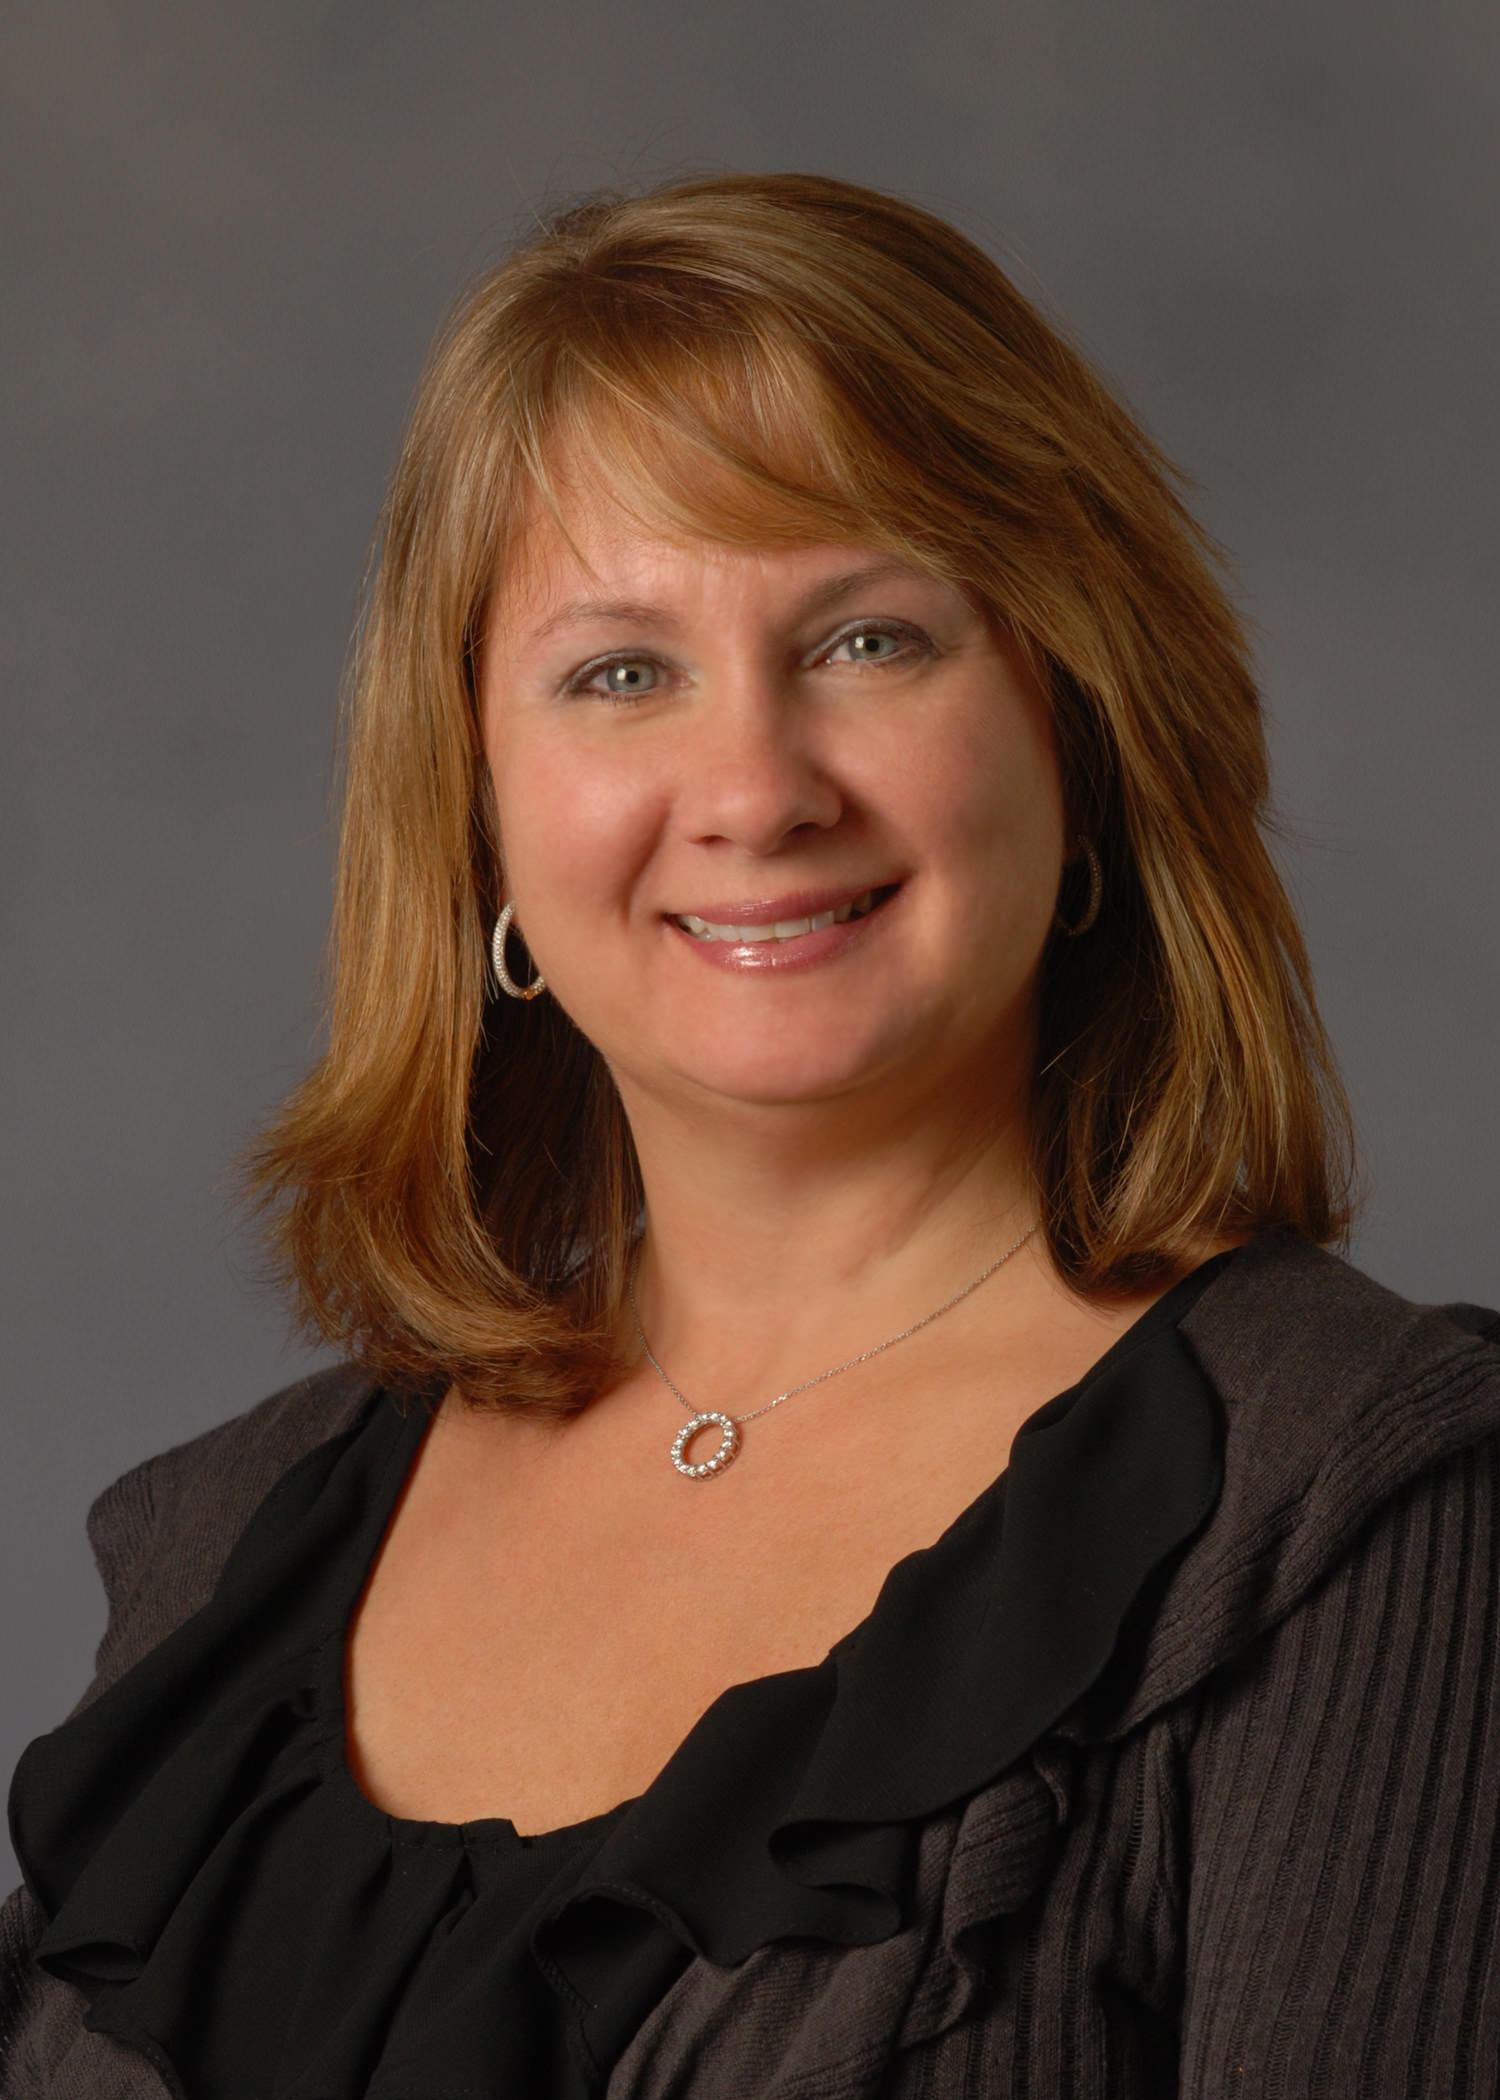 Annette S Foti, MD